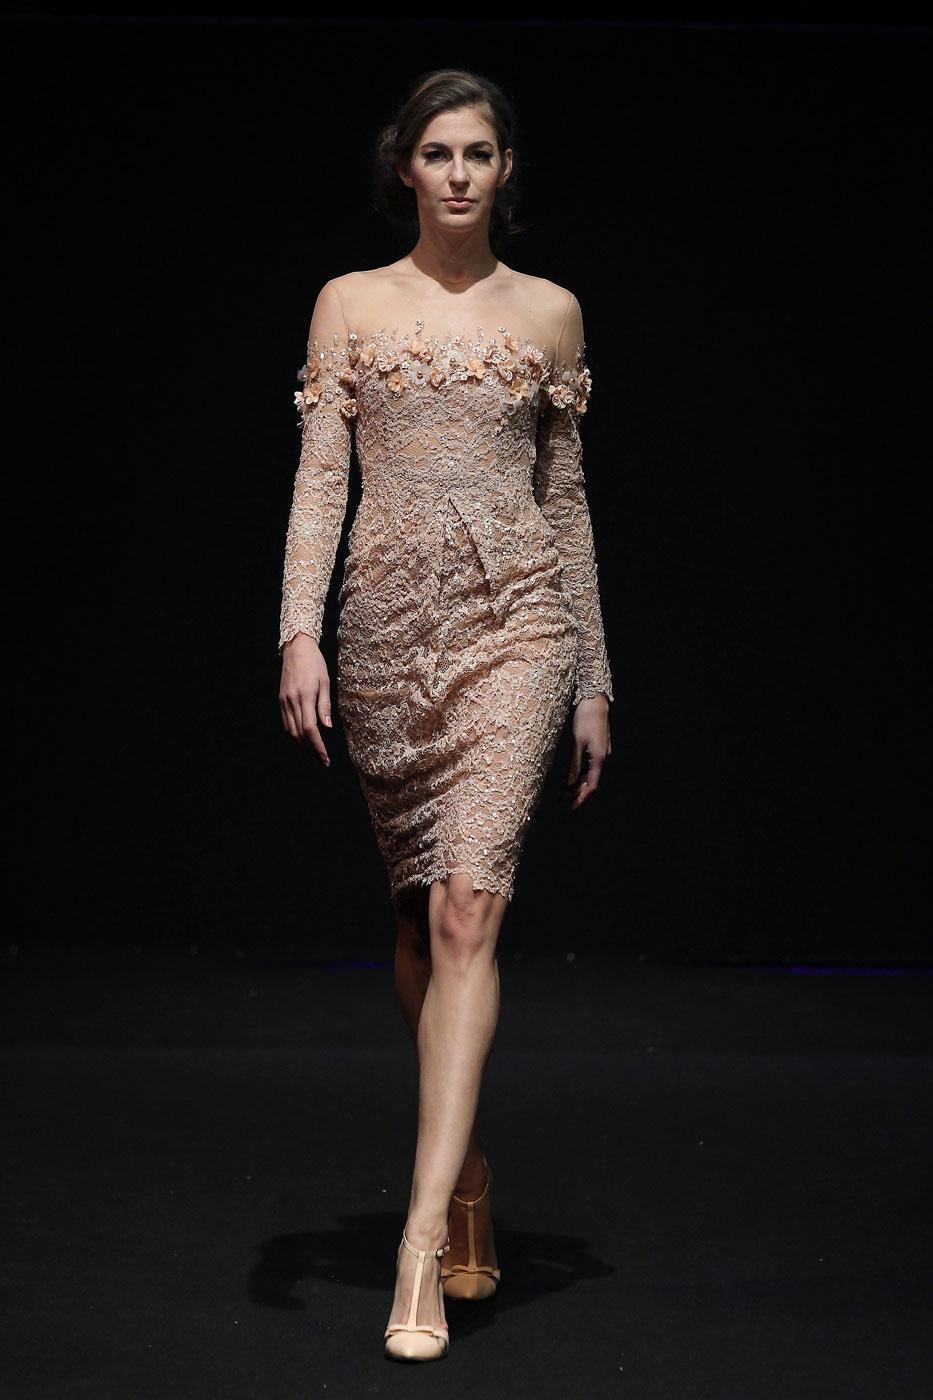 Abed-Mahfouz-fashion-runway-show-haute-couture-paris-spring-2015-the-impression-18